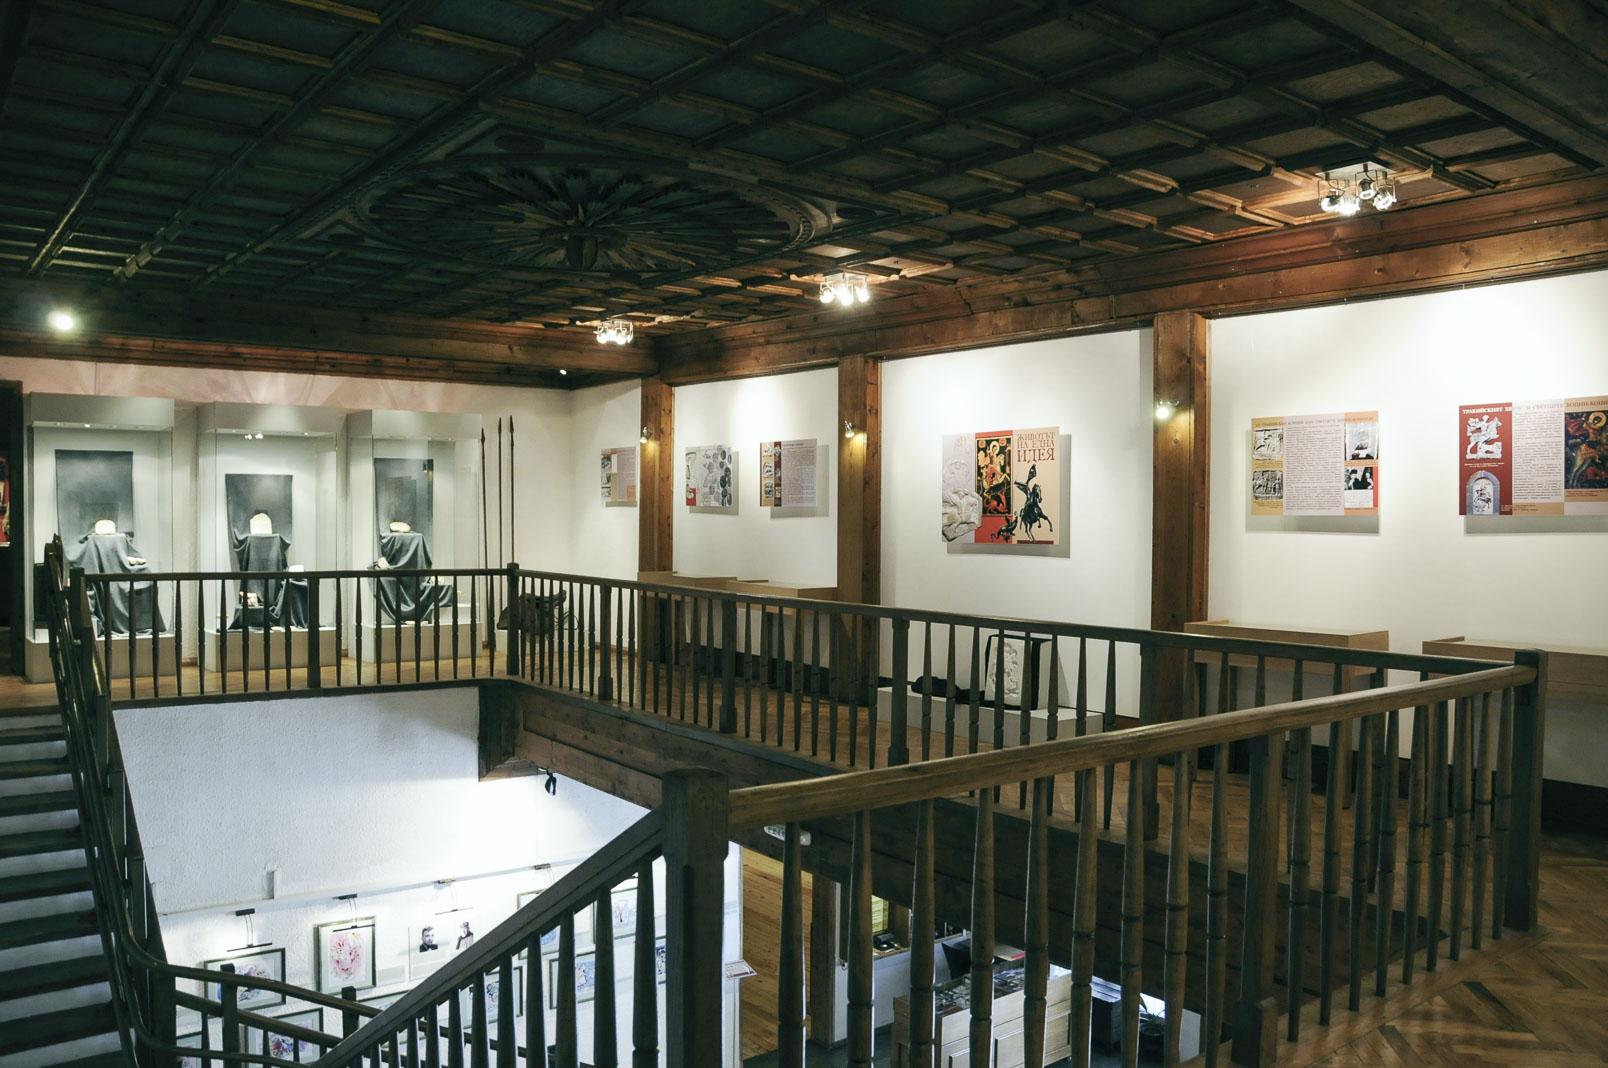 troyan-museum-jivotat-na-edna-idea-21